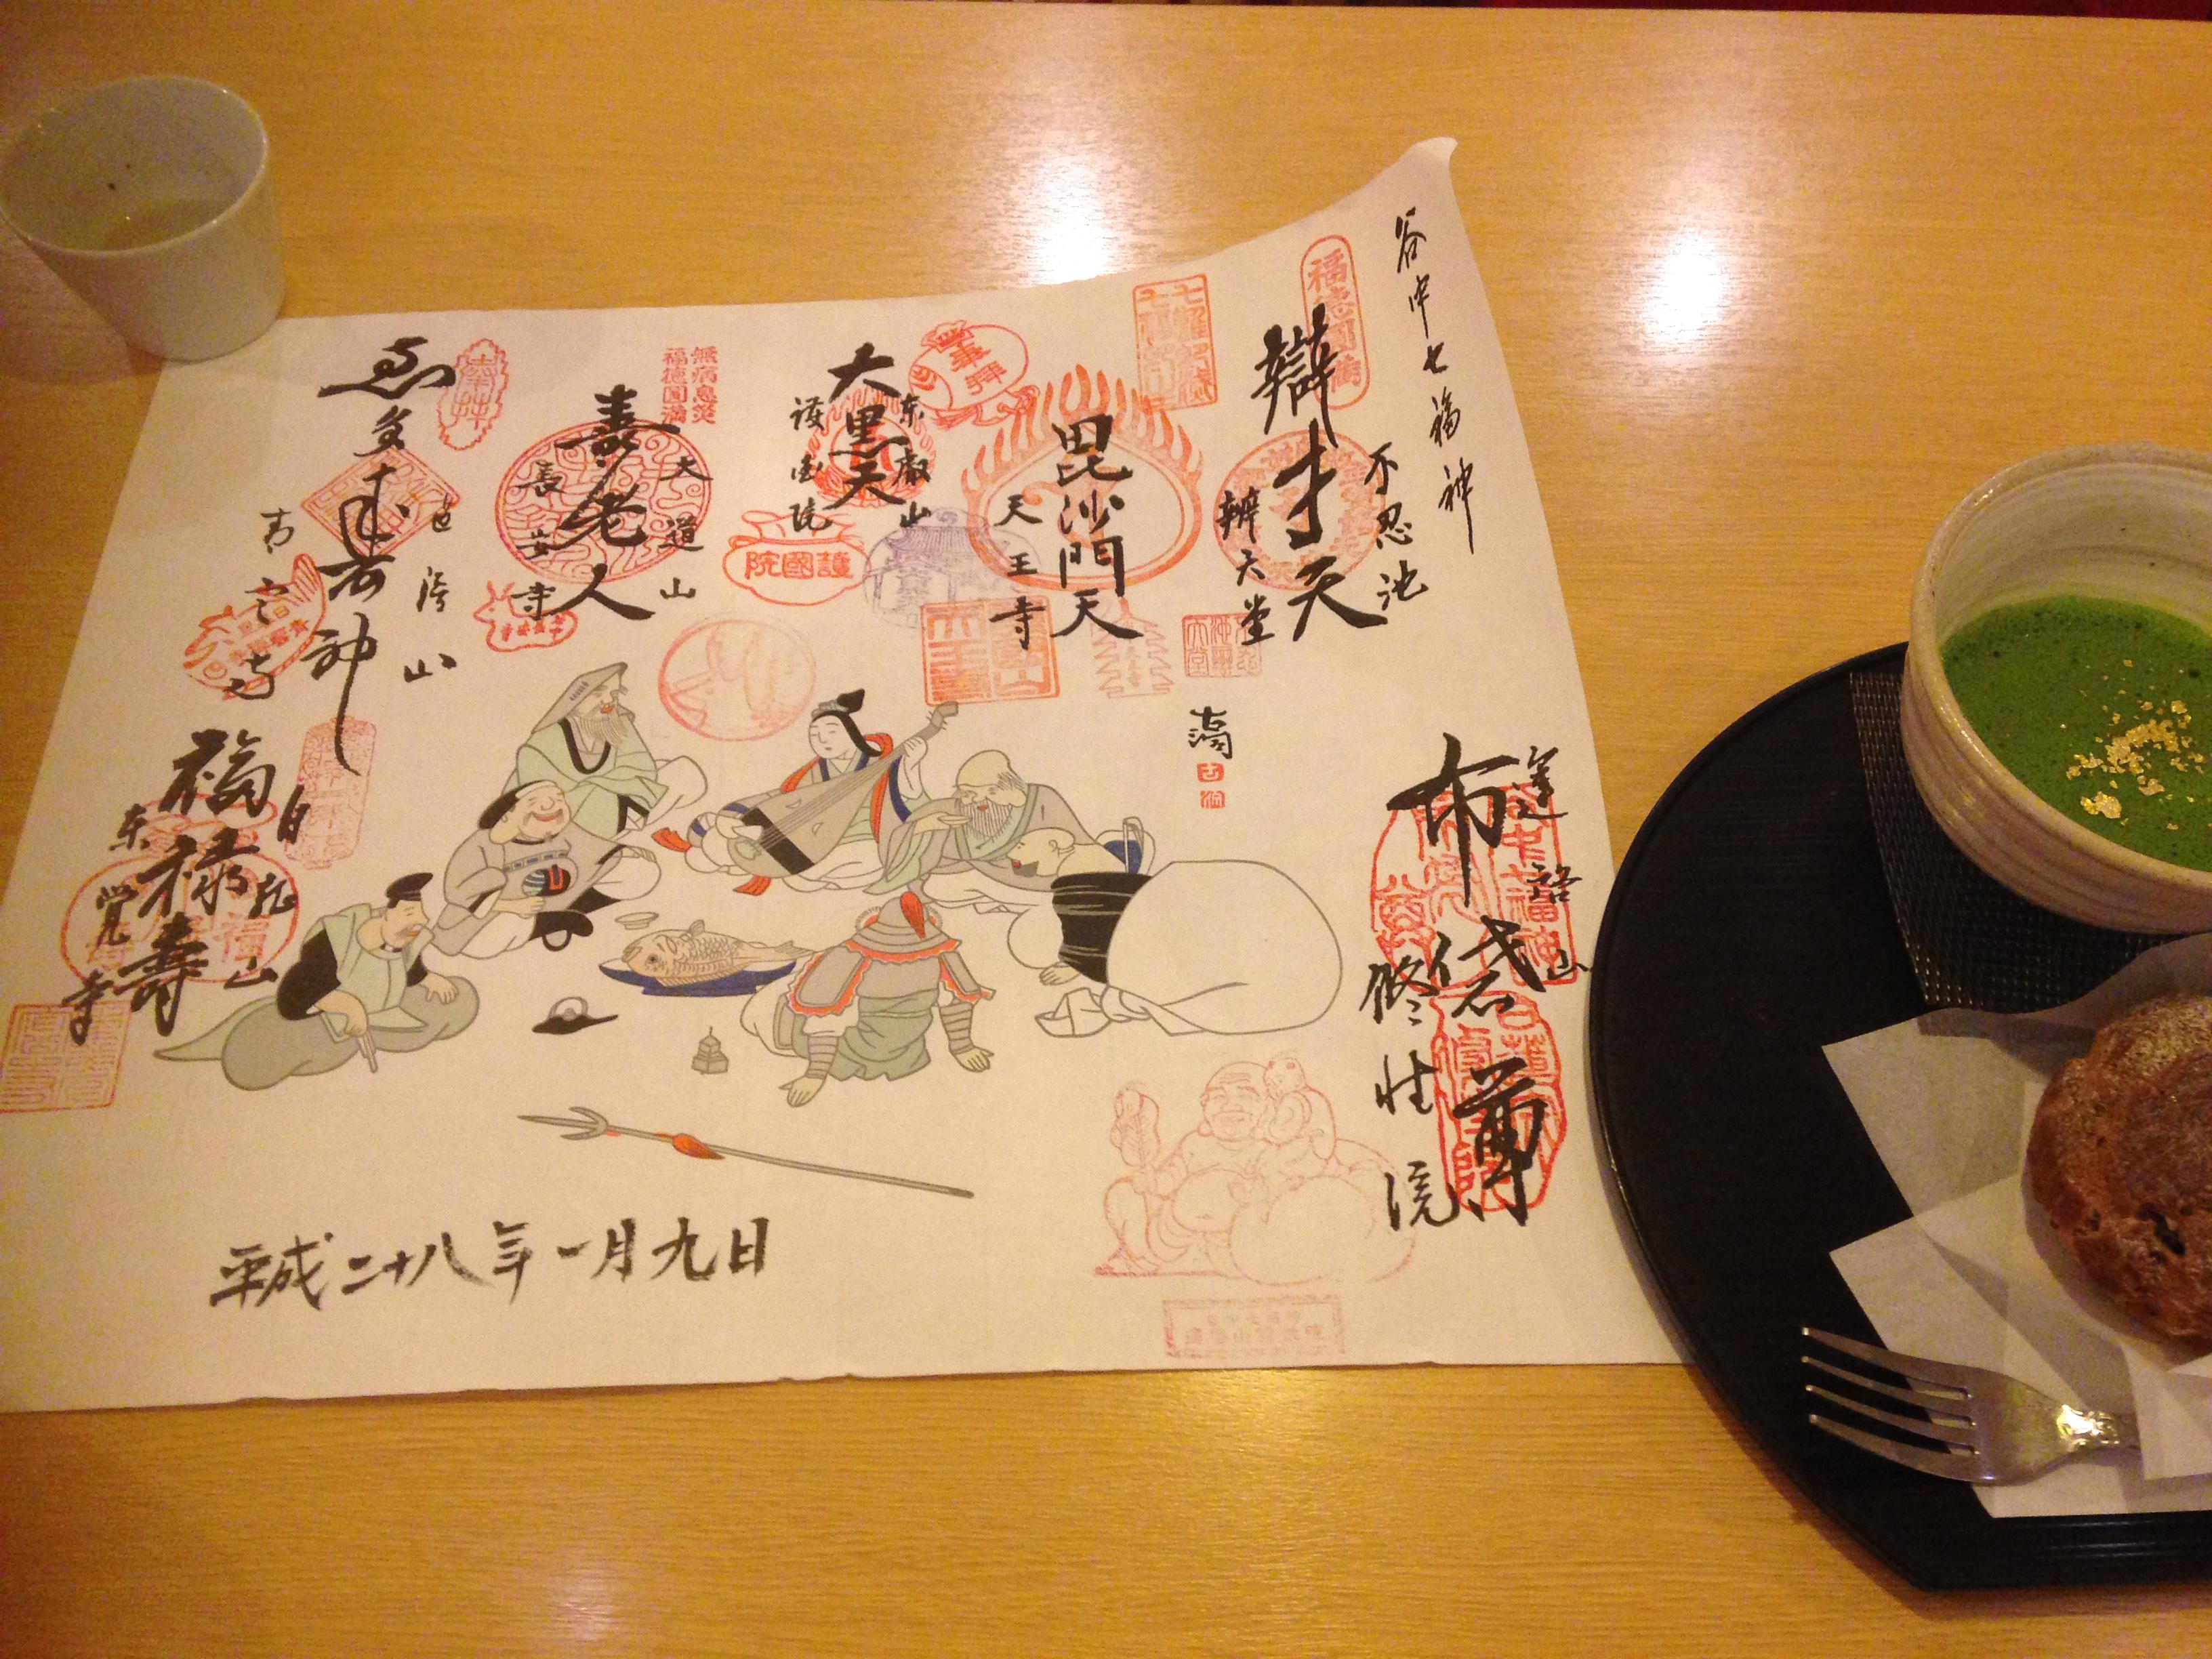 Shichifukujin Meguri Start The Year Off Right With This Tokyo Pilgrimage